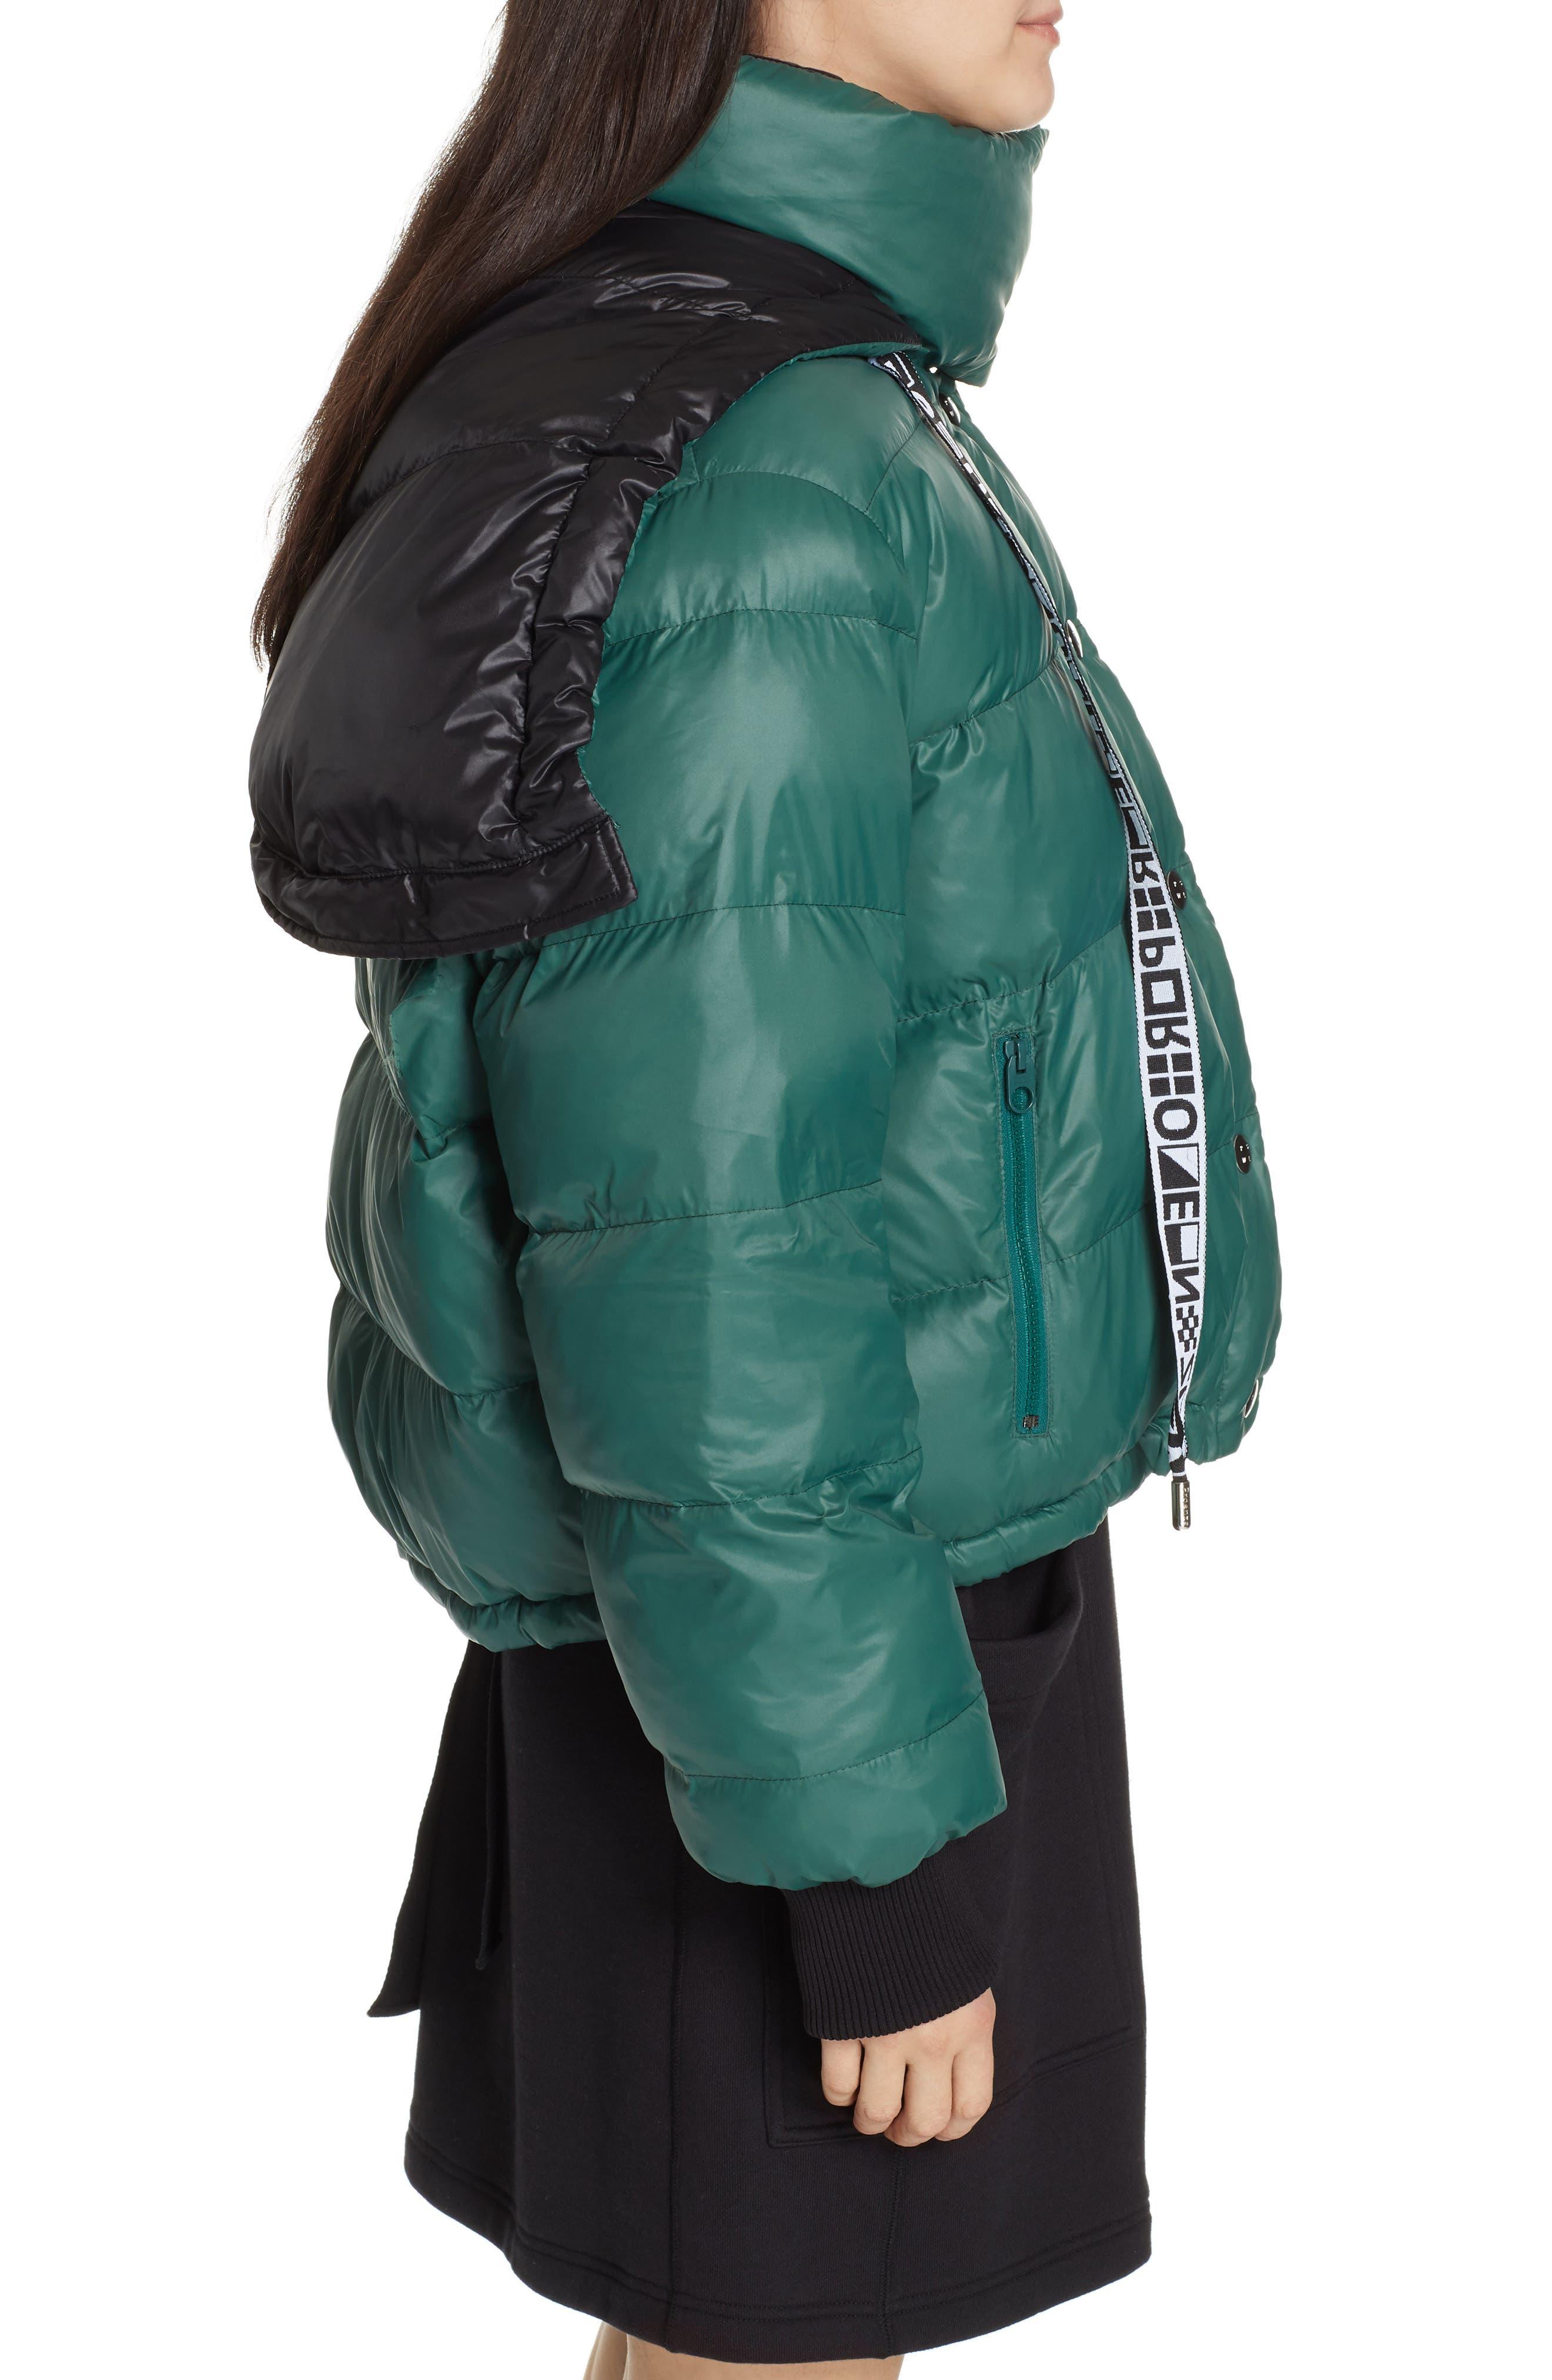 PROENZA SCHOULER, PSWL Reversible Puffer Coat, Alternate thumbnail 5, color, GREEN/ BLACK